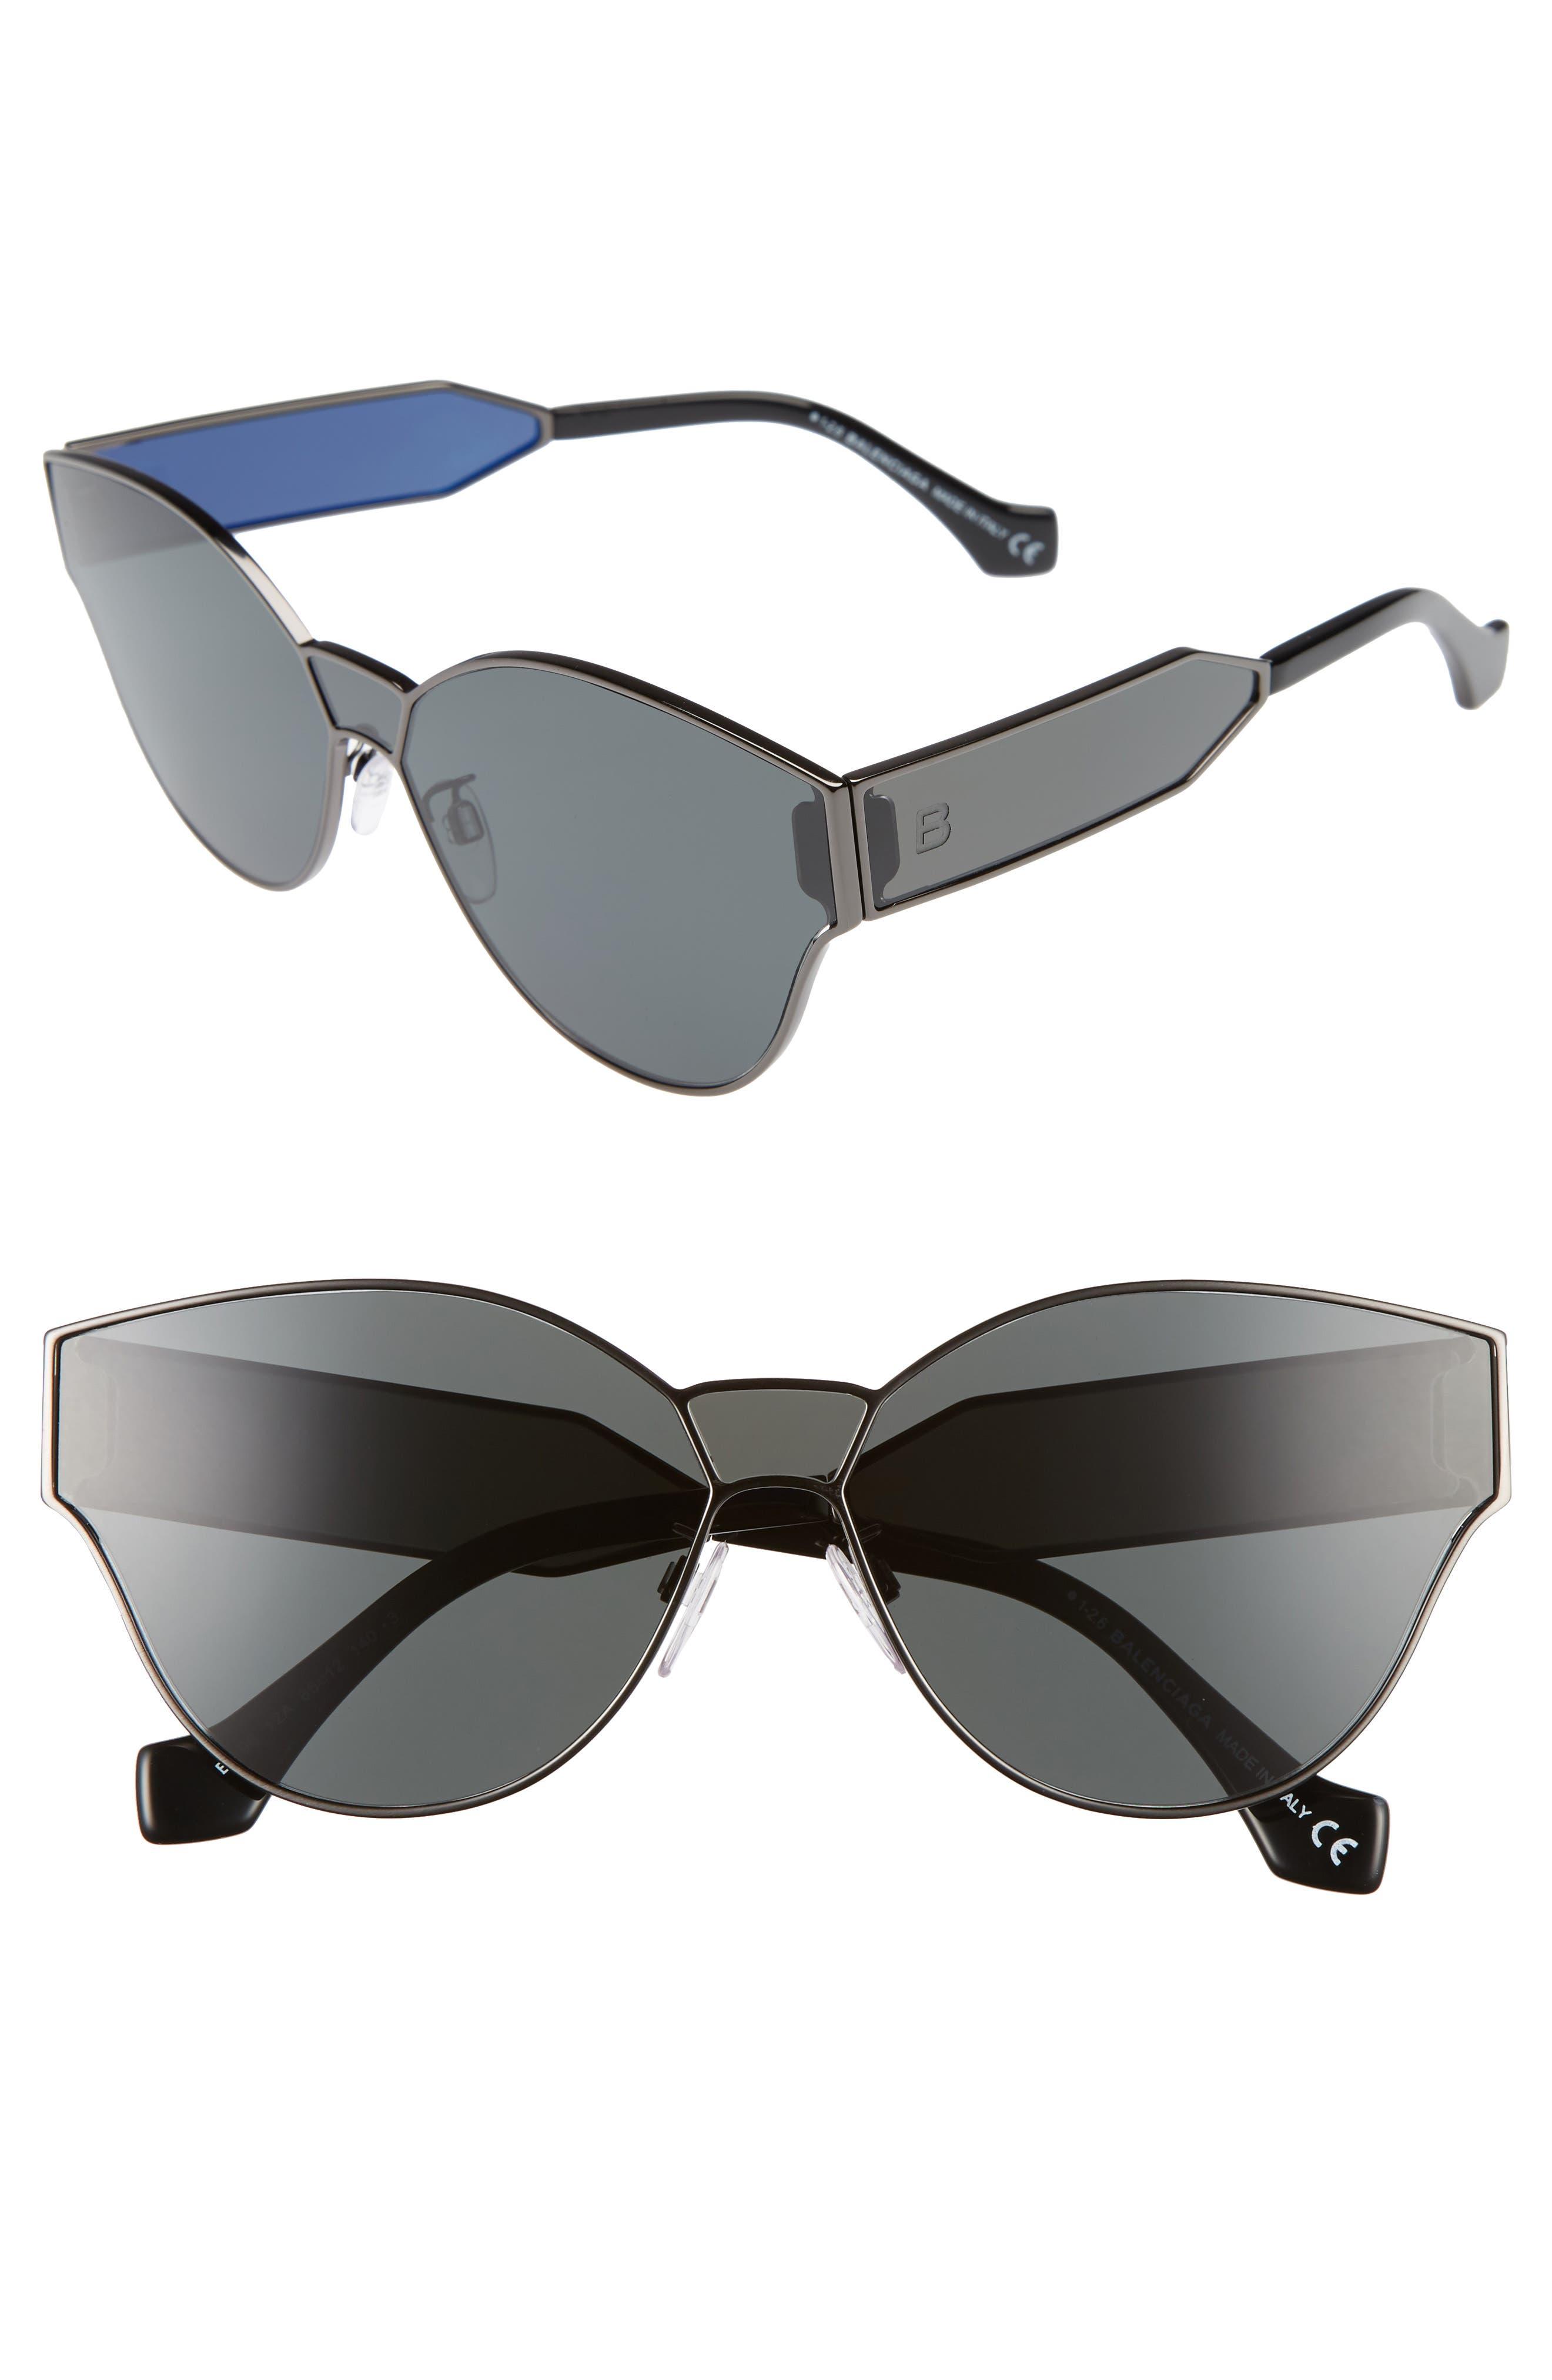 65mm Sunglasses,                         Main,                         color, 040